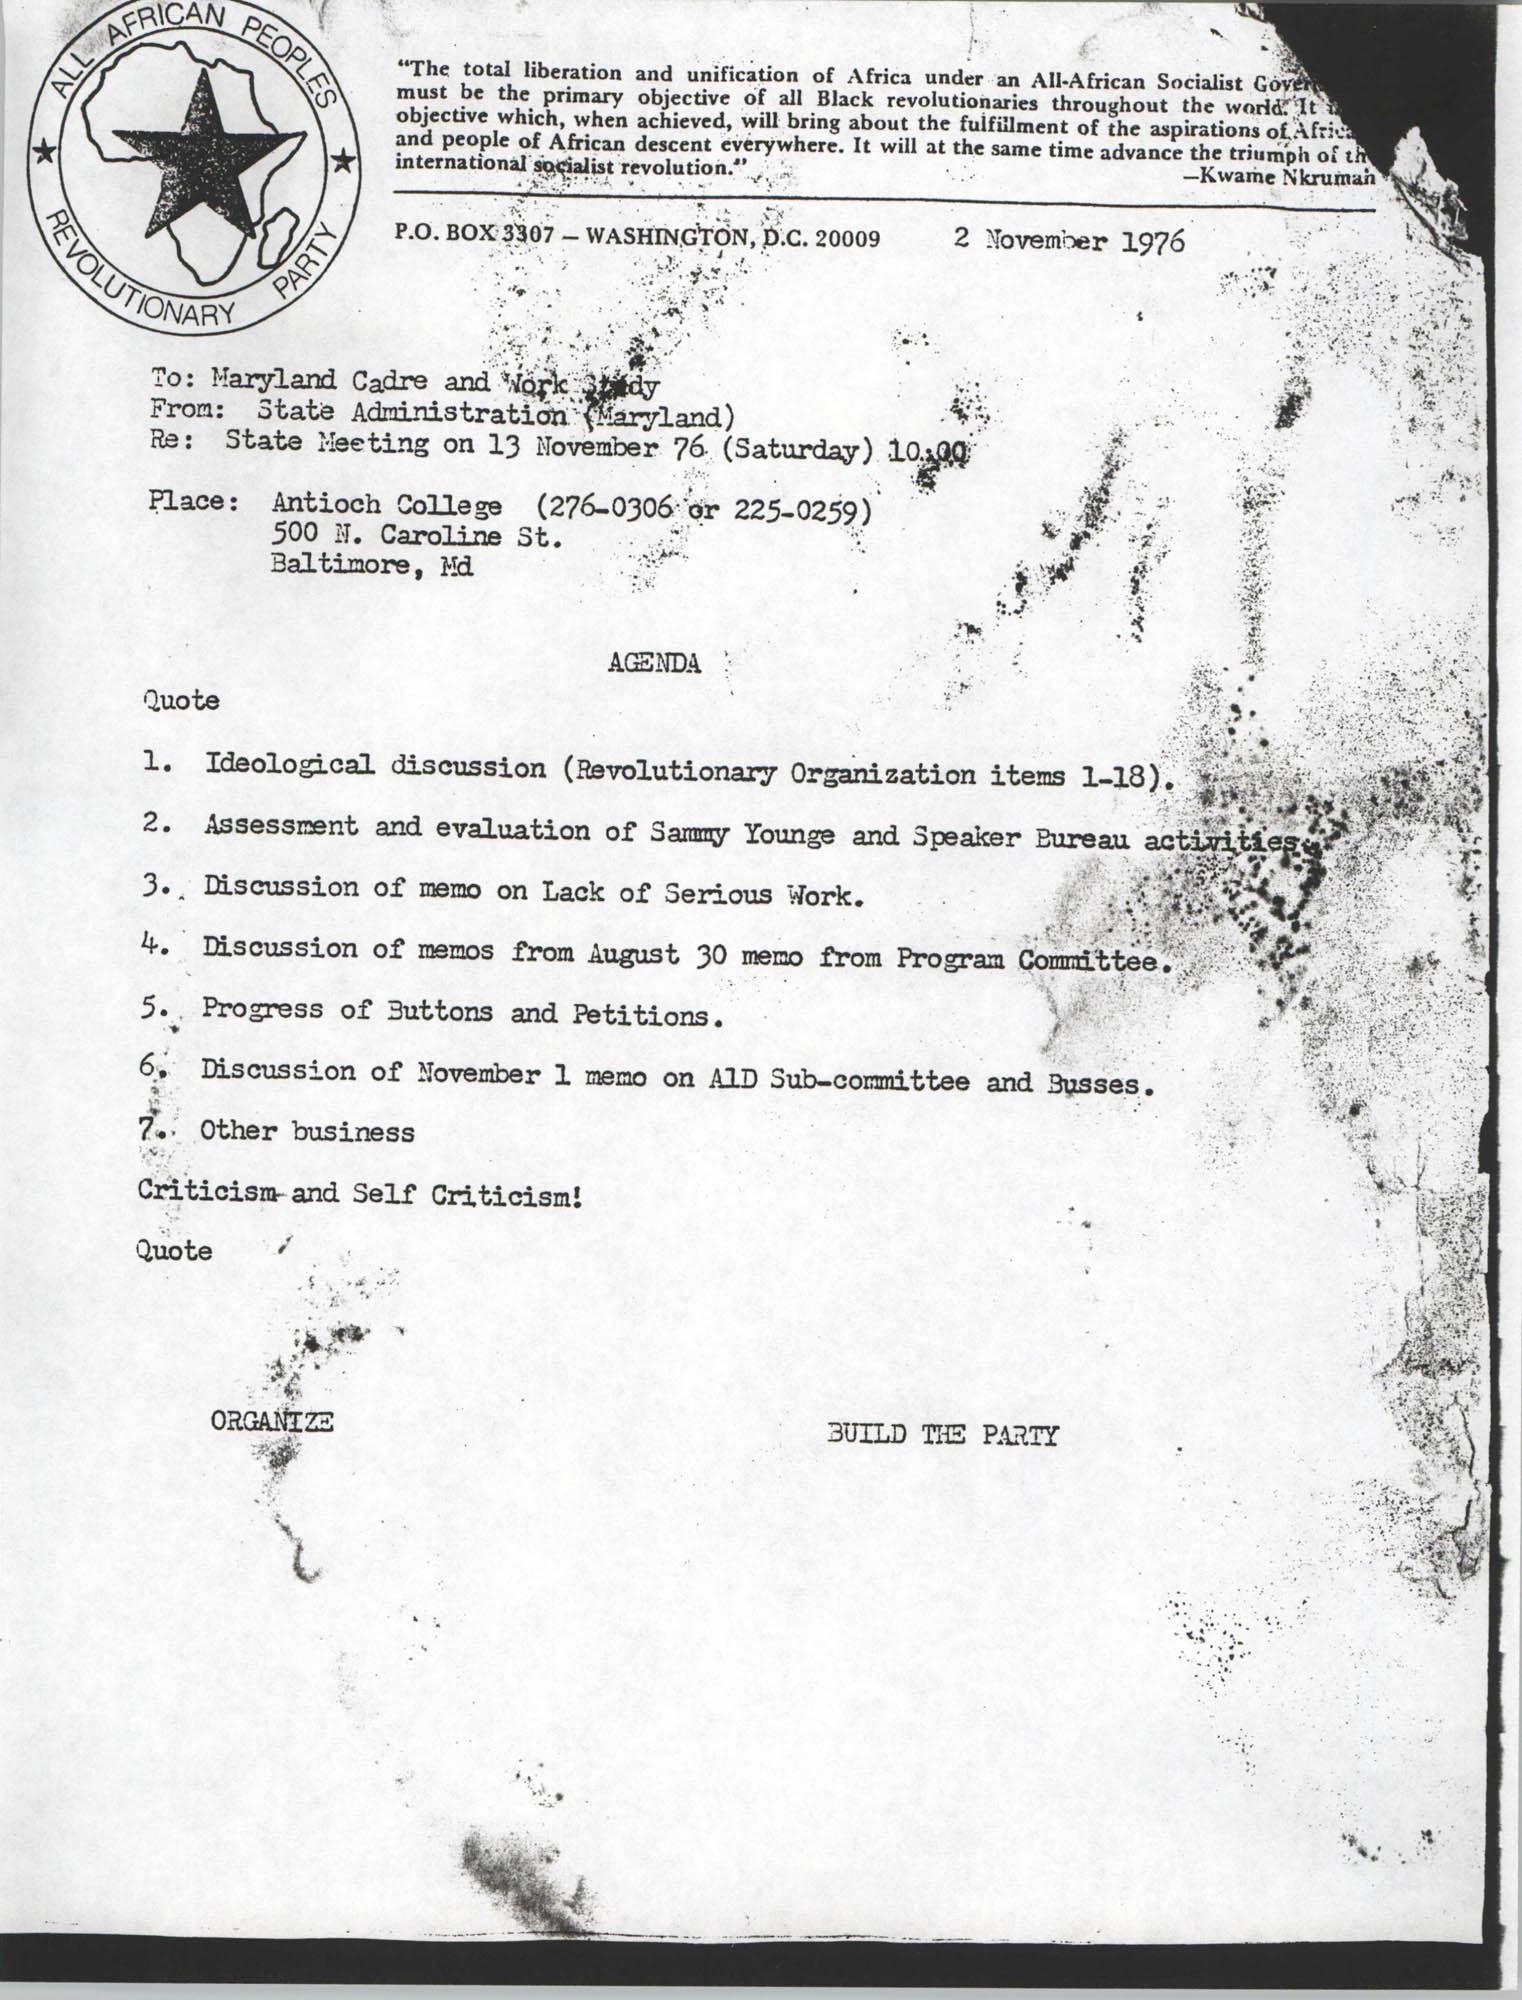 All African People's Revolutionary Party Memorandum, November 2, 1976